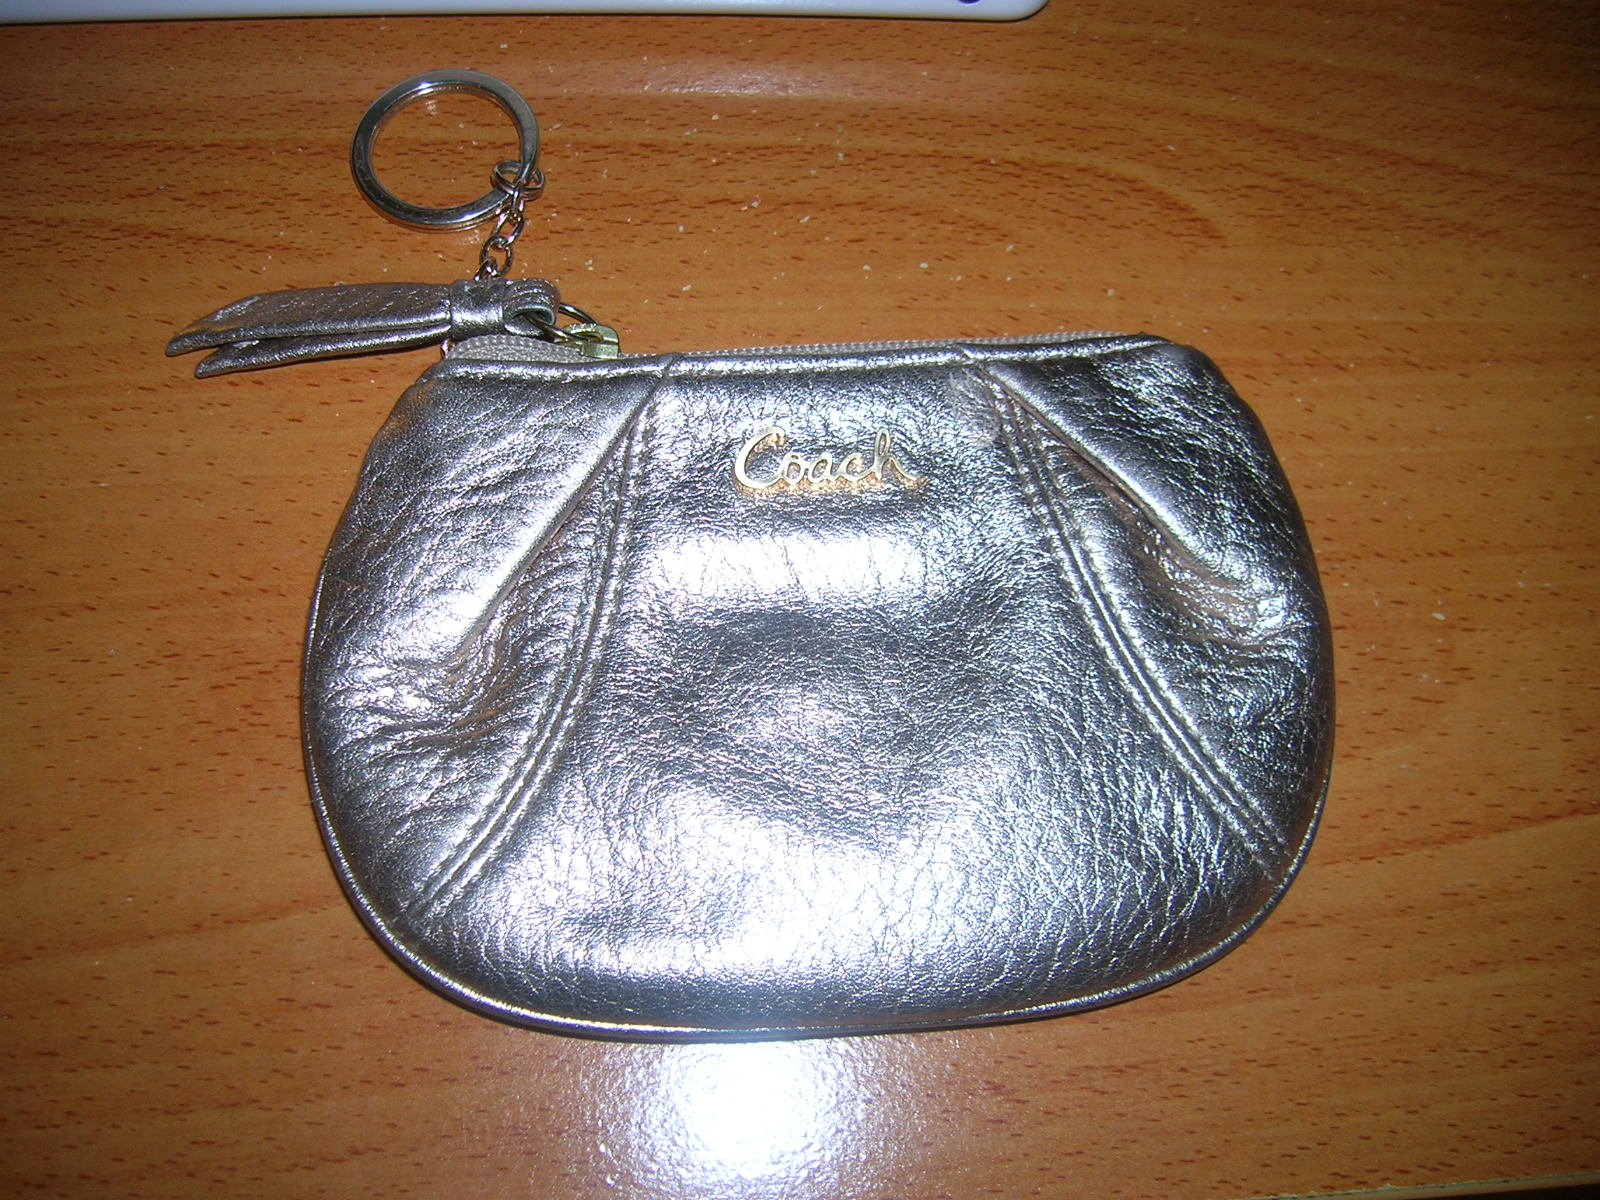 Avon Mark Makeup Item 4 Mark by Avon Makeup